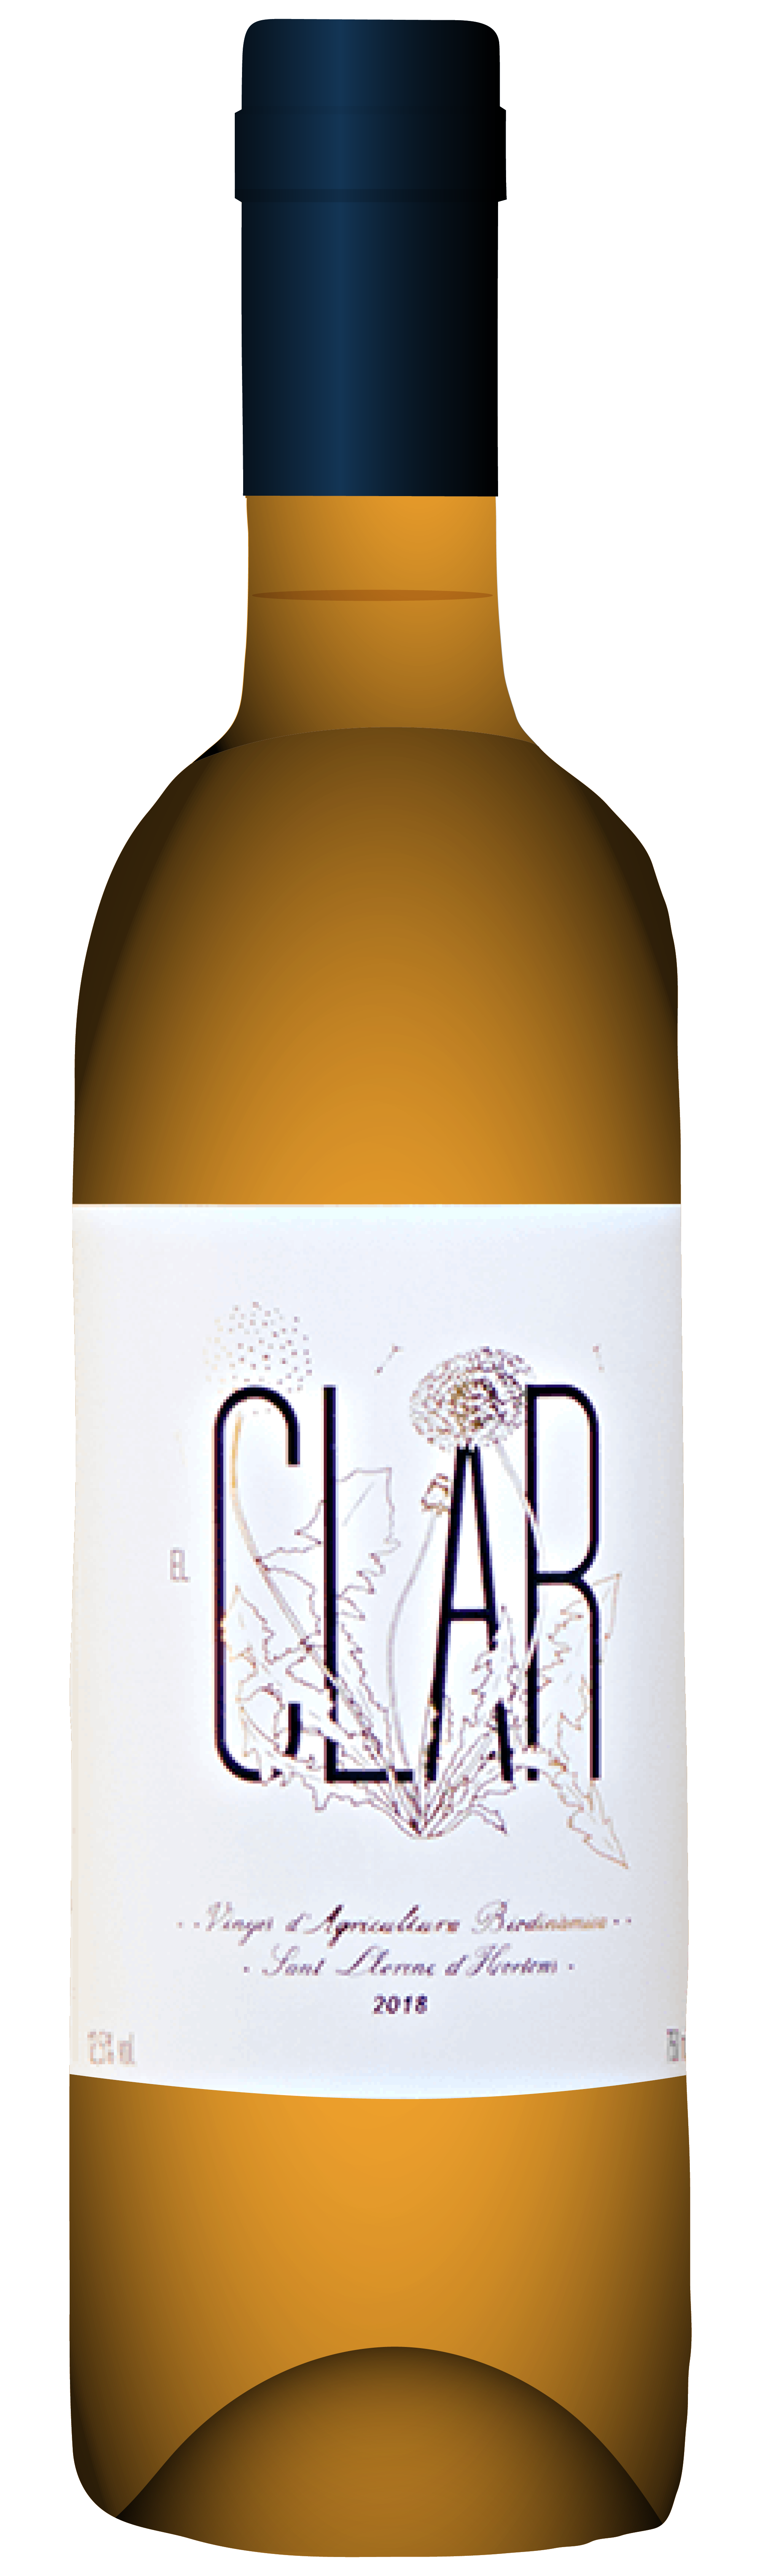 the natural wine company club november 2020 spain finca parera clar